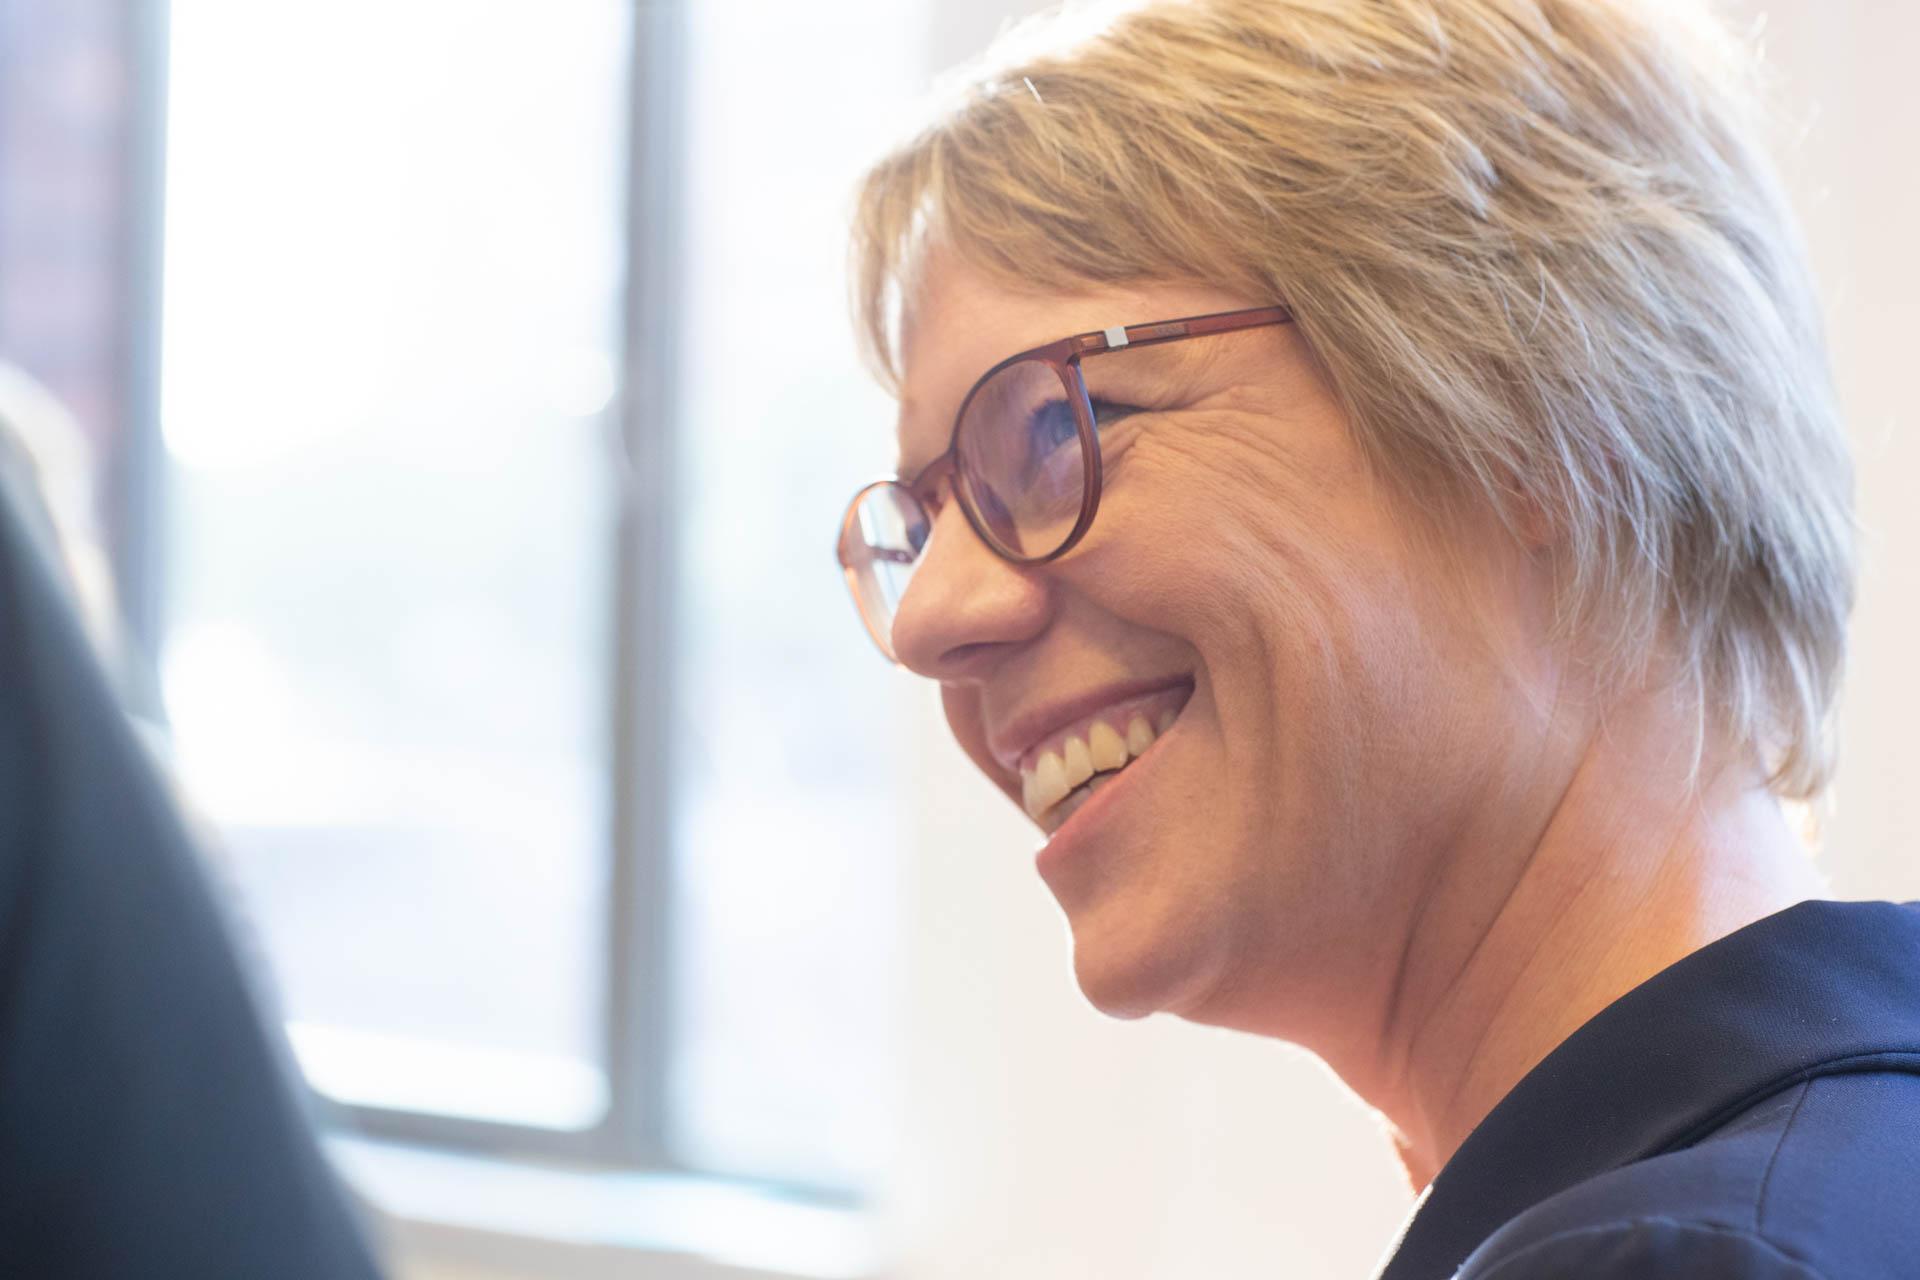 Dr. Kristina Böhlke bei einem Workshop lächelt einen Teilnehmer an